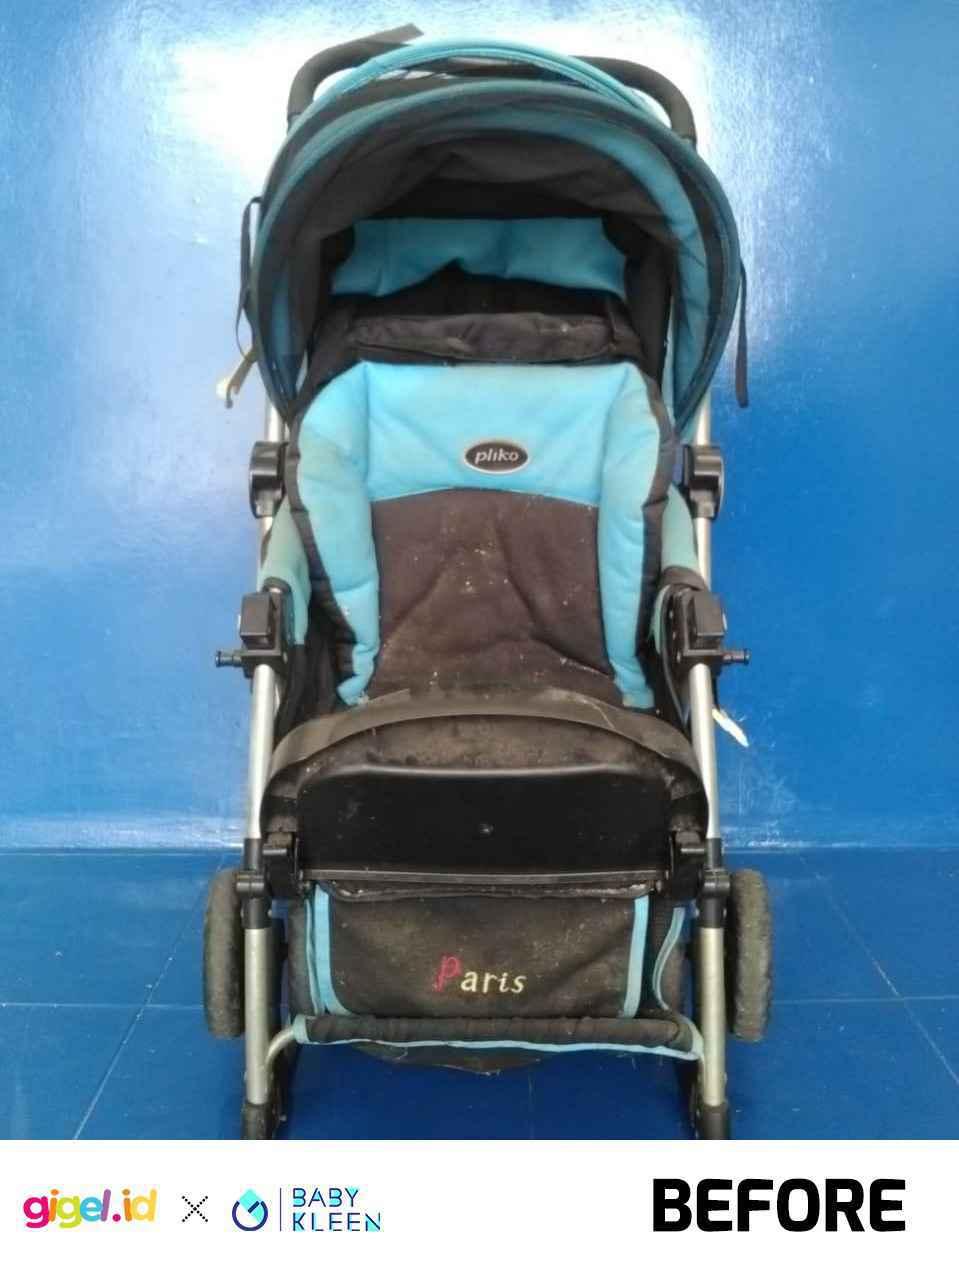 GIGEL.ID x Baby Kleen Laundry Stroller - 3